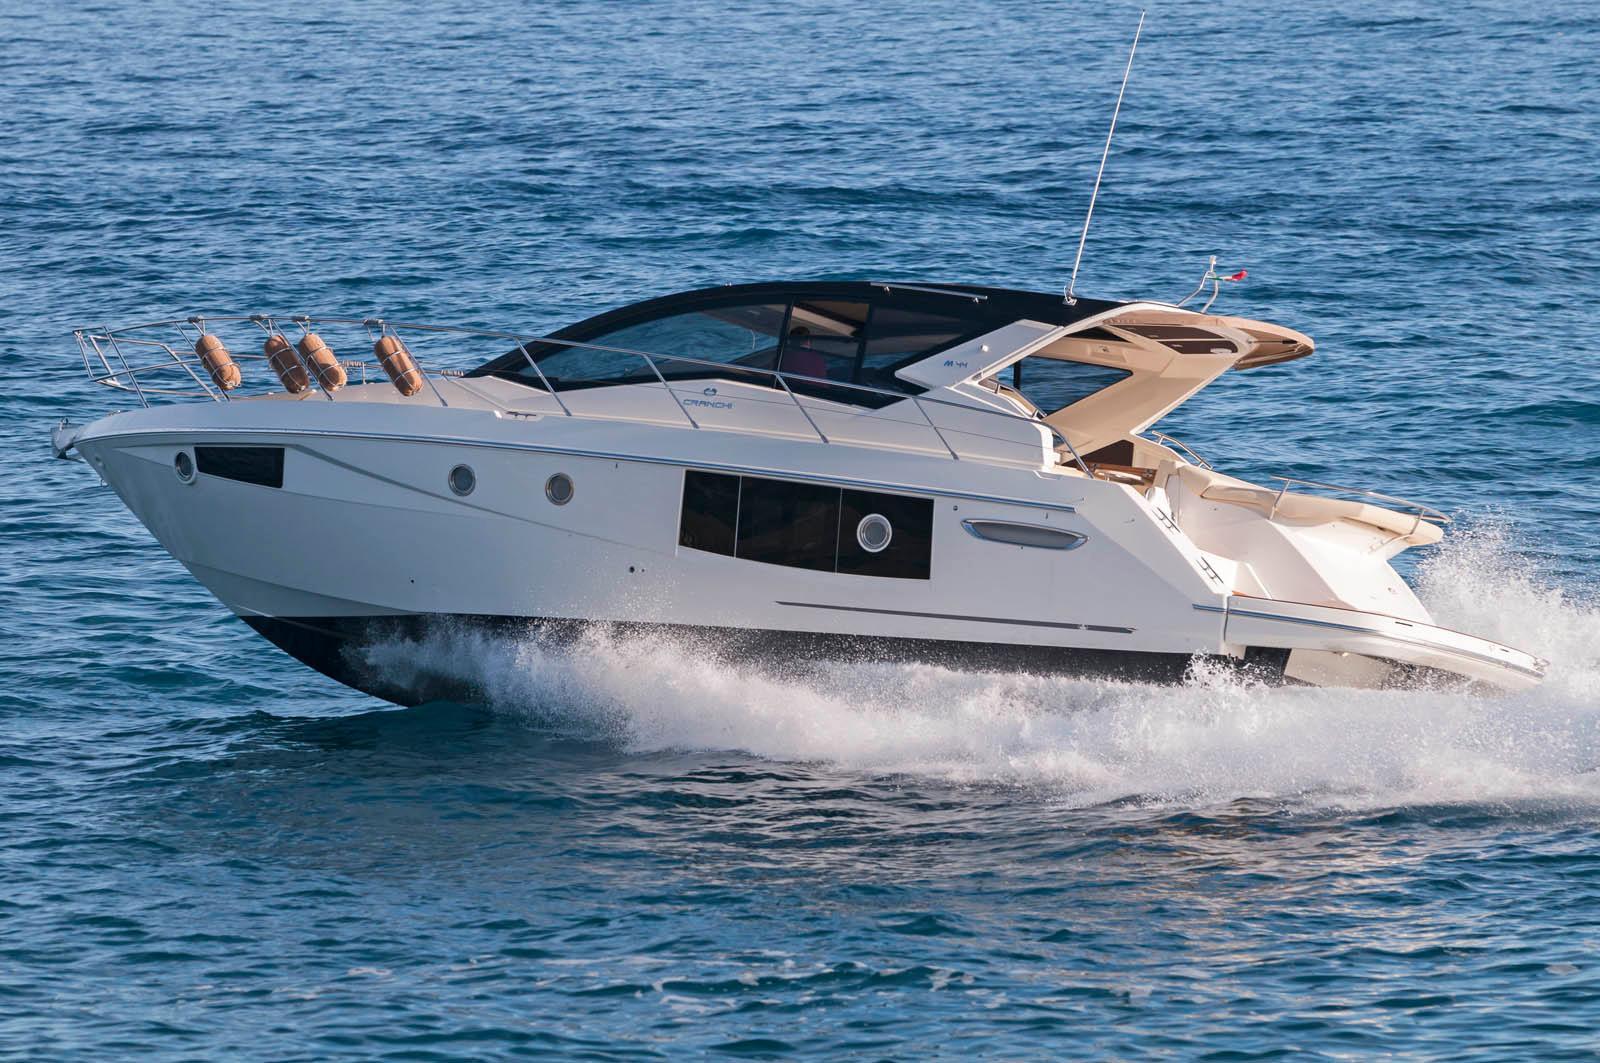 2017 Cranchi M44 HT Power Boat For Sale Wwwyachtworldcom